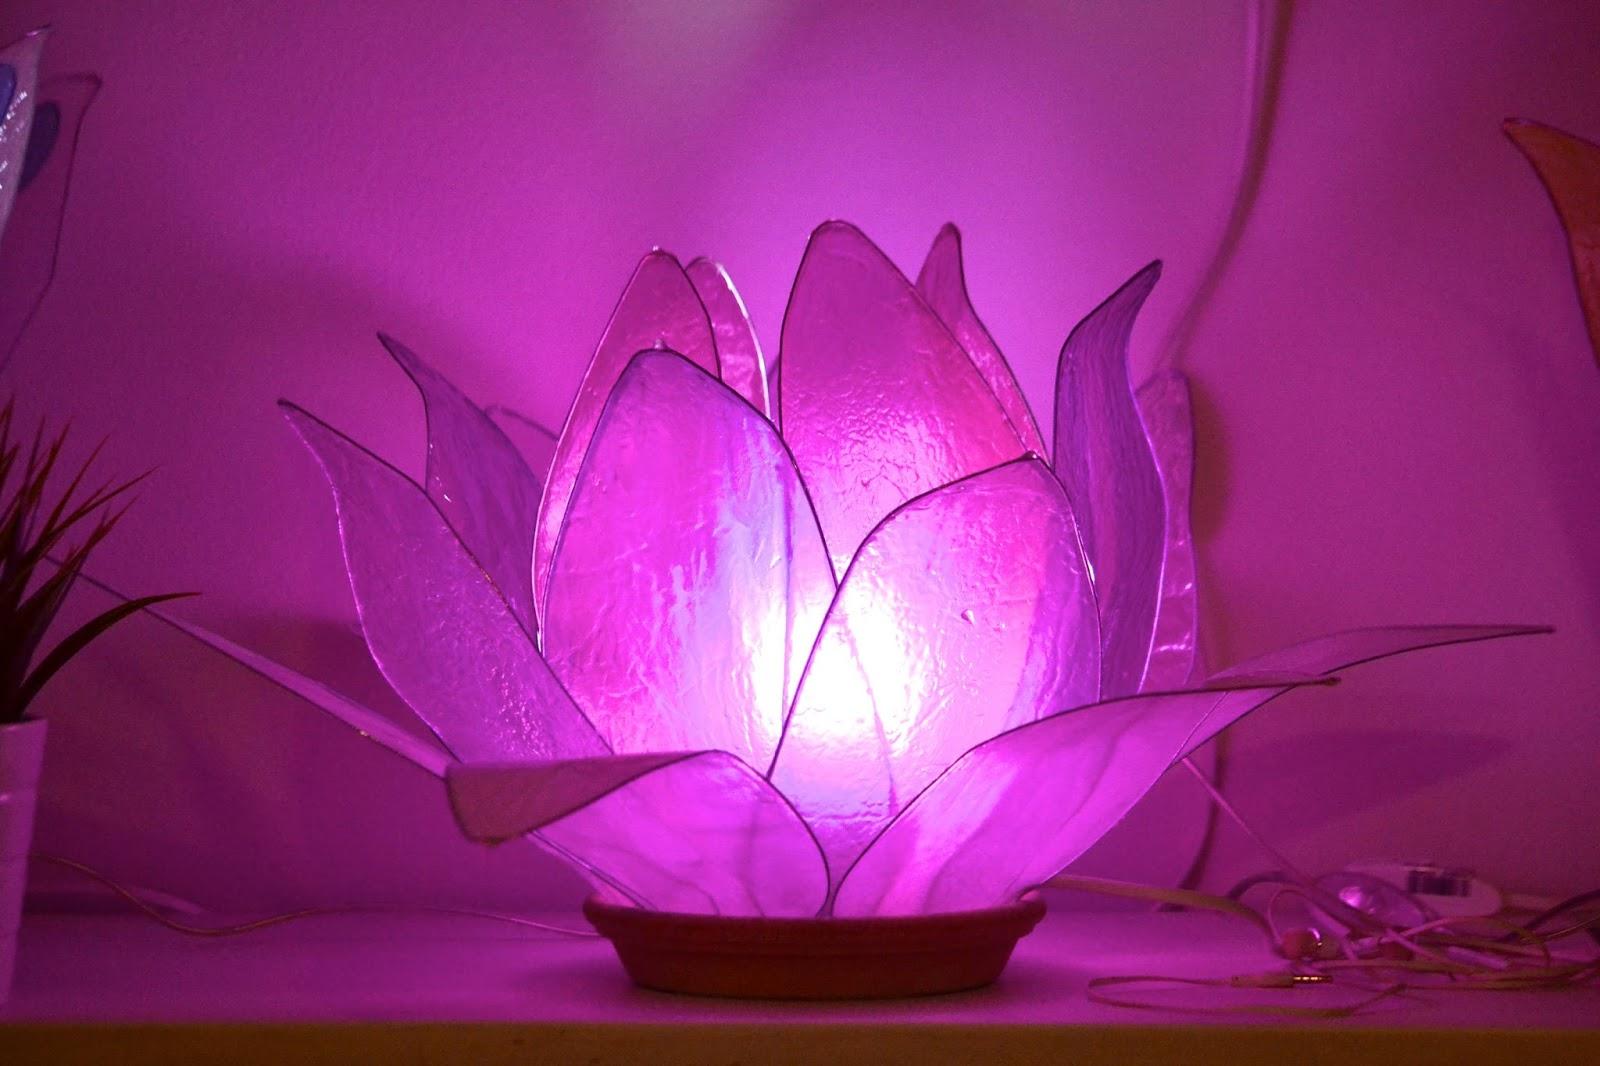 lampada fiore di loto ninfea